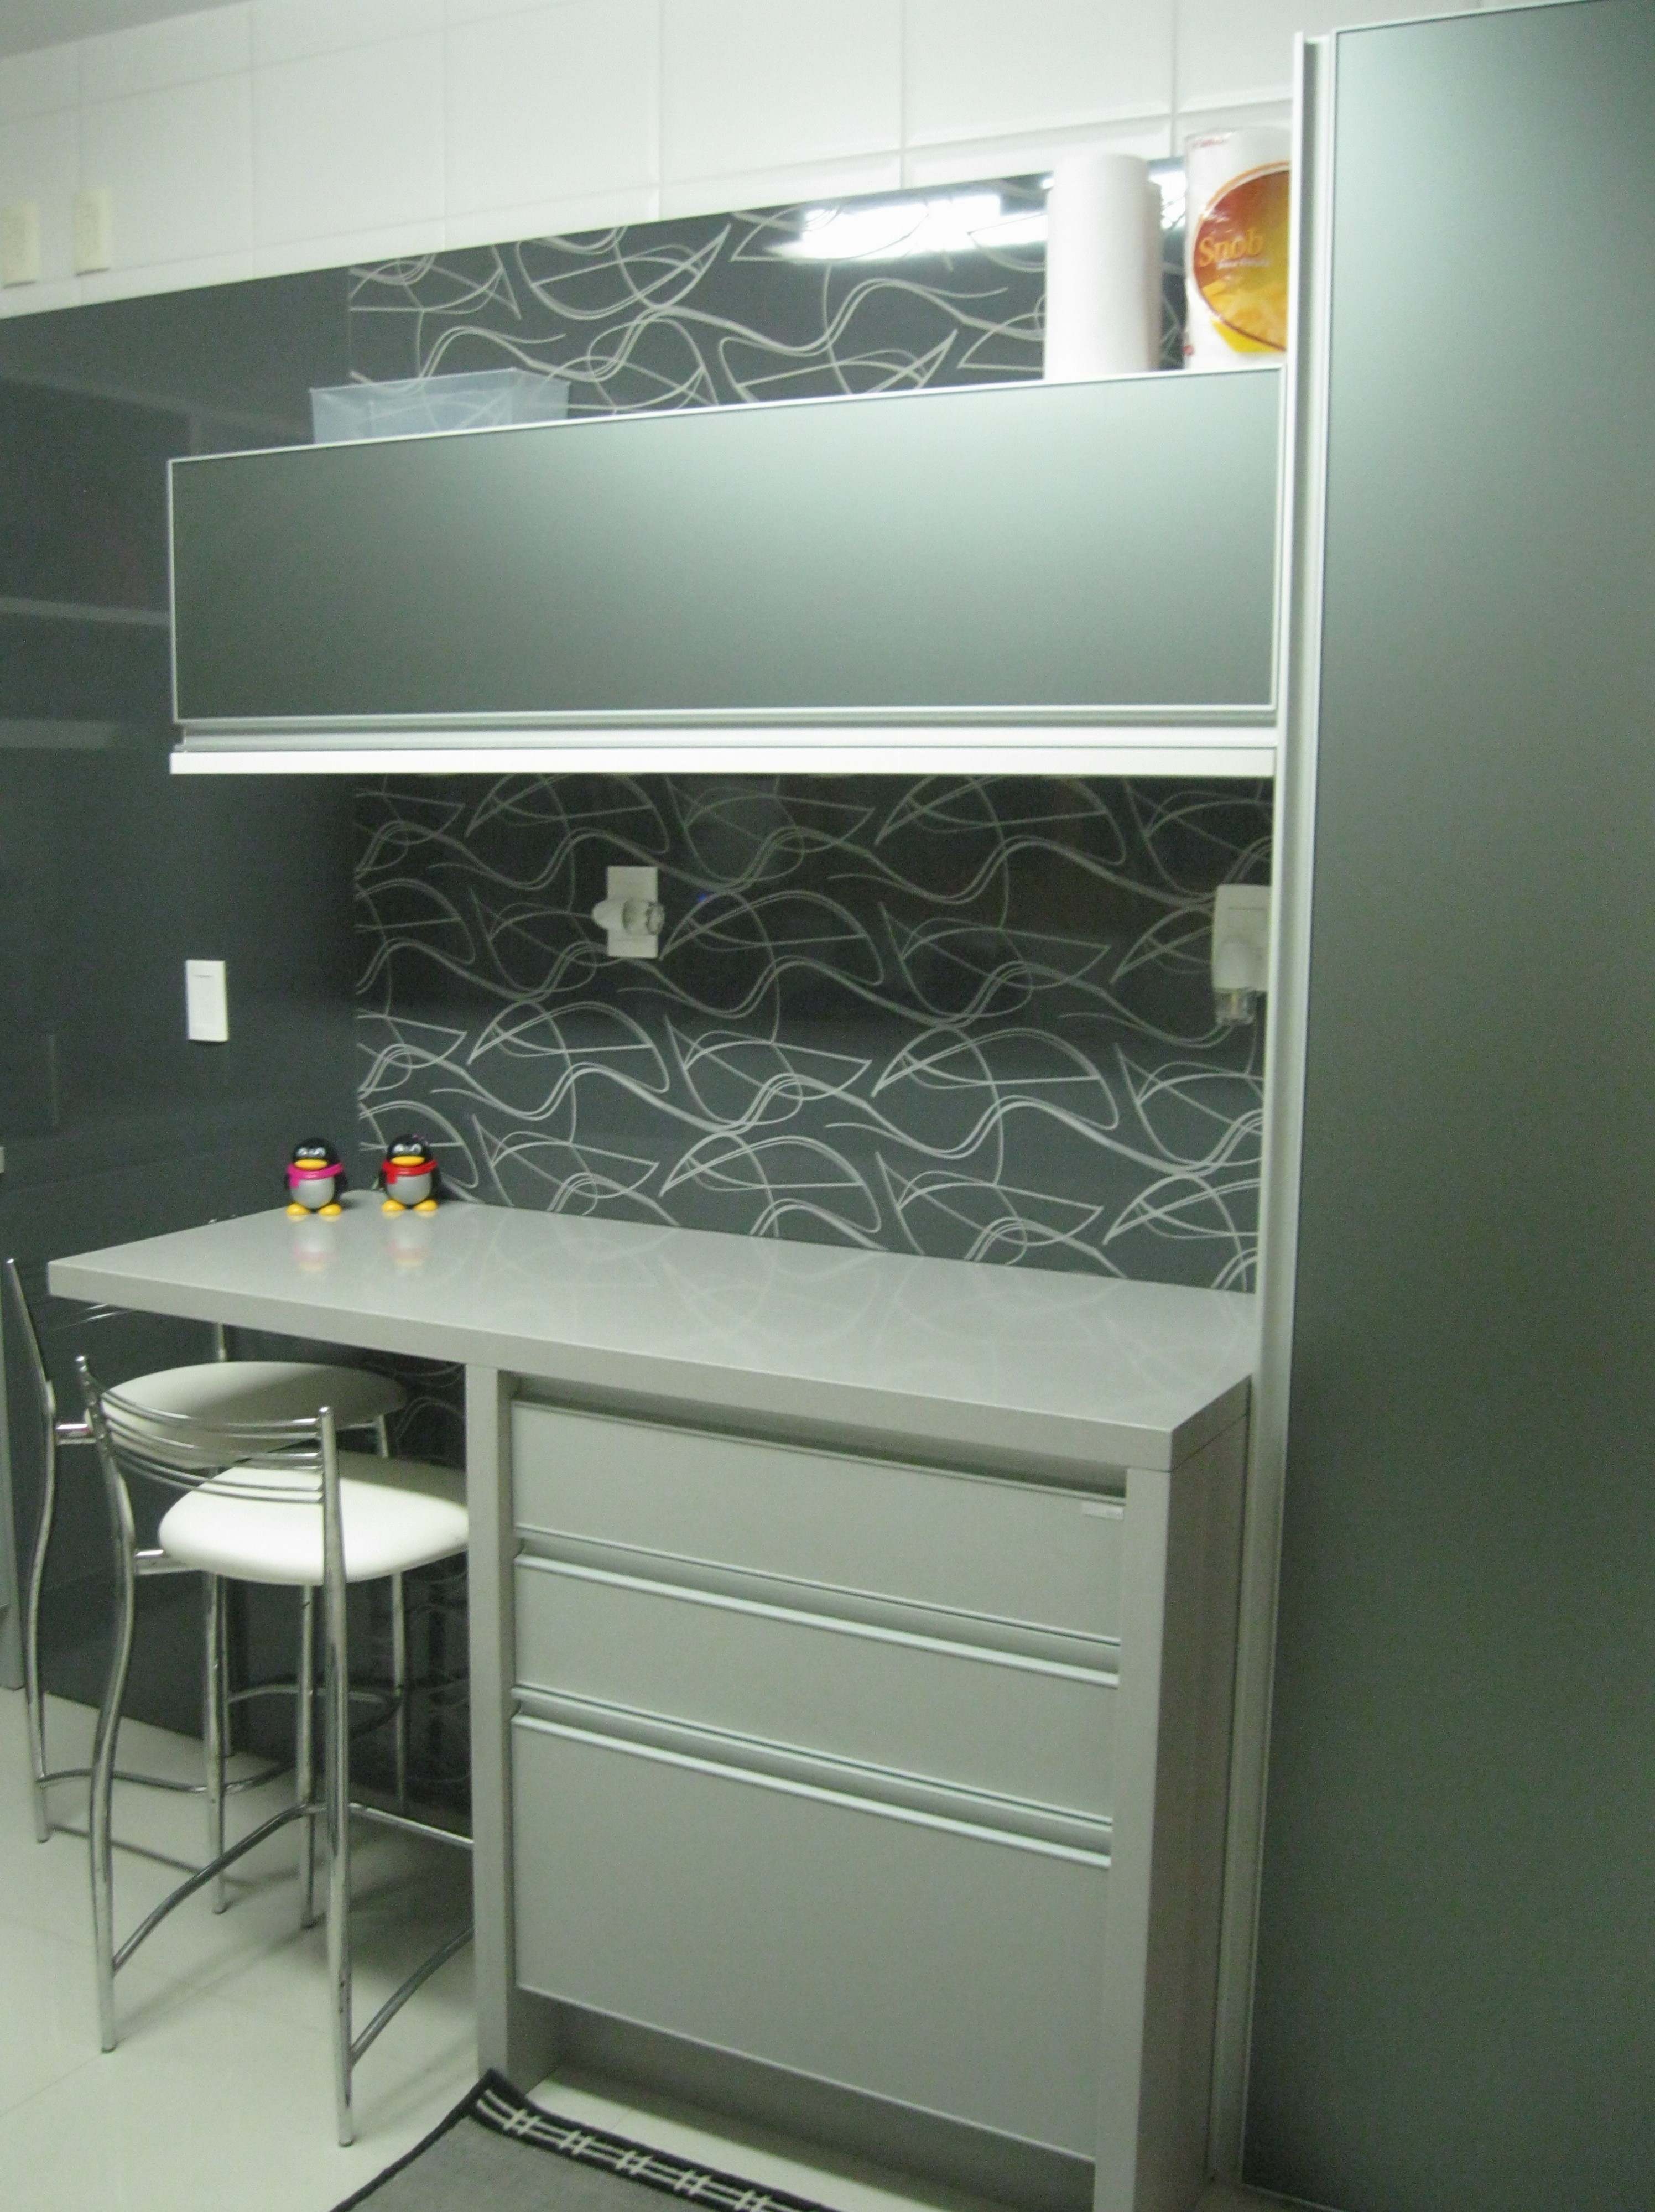 Cozinha – Av. Dom Joaquim #977134 2992 3999